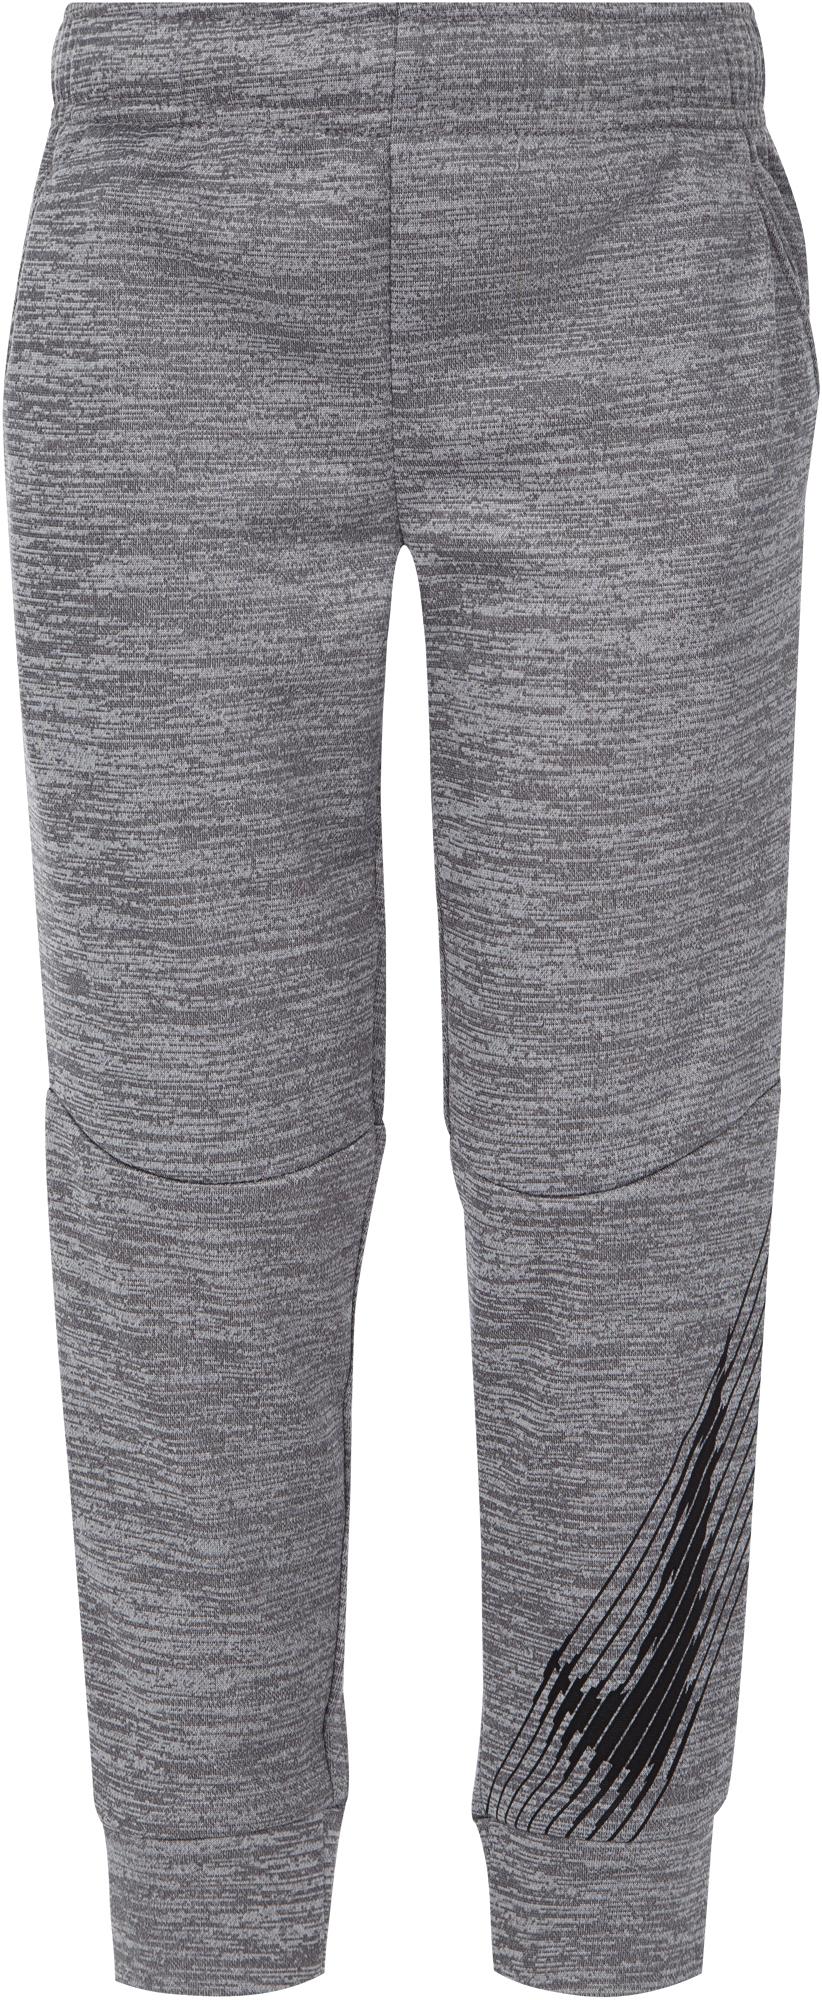 Nike Брюки для мальчиков Nike Therma, размер 122 цена 2017